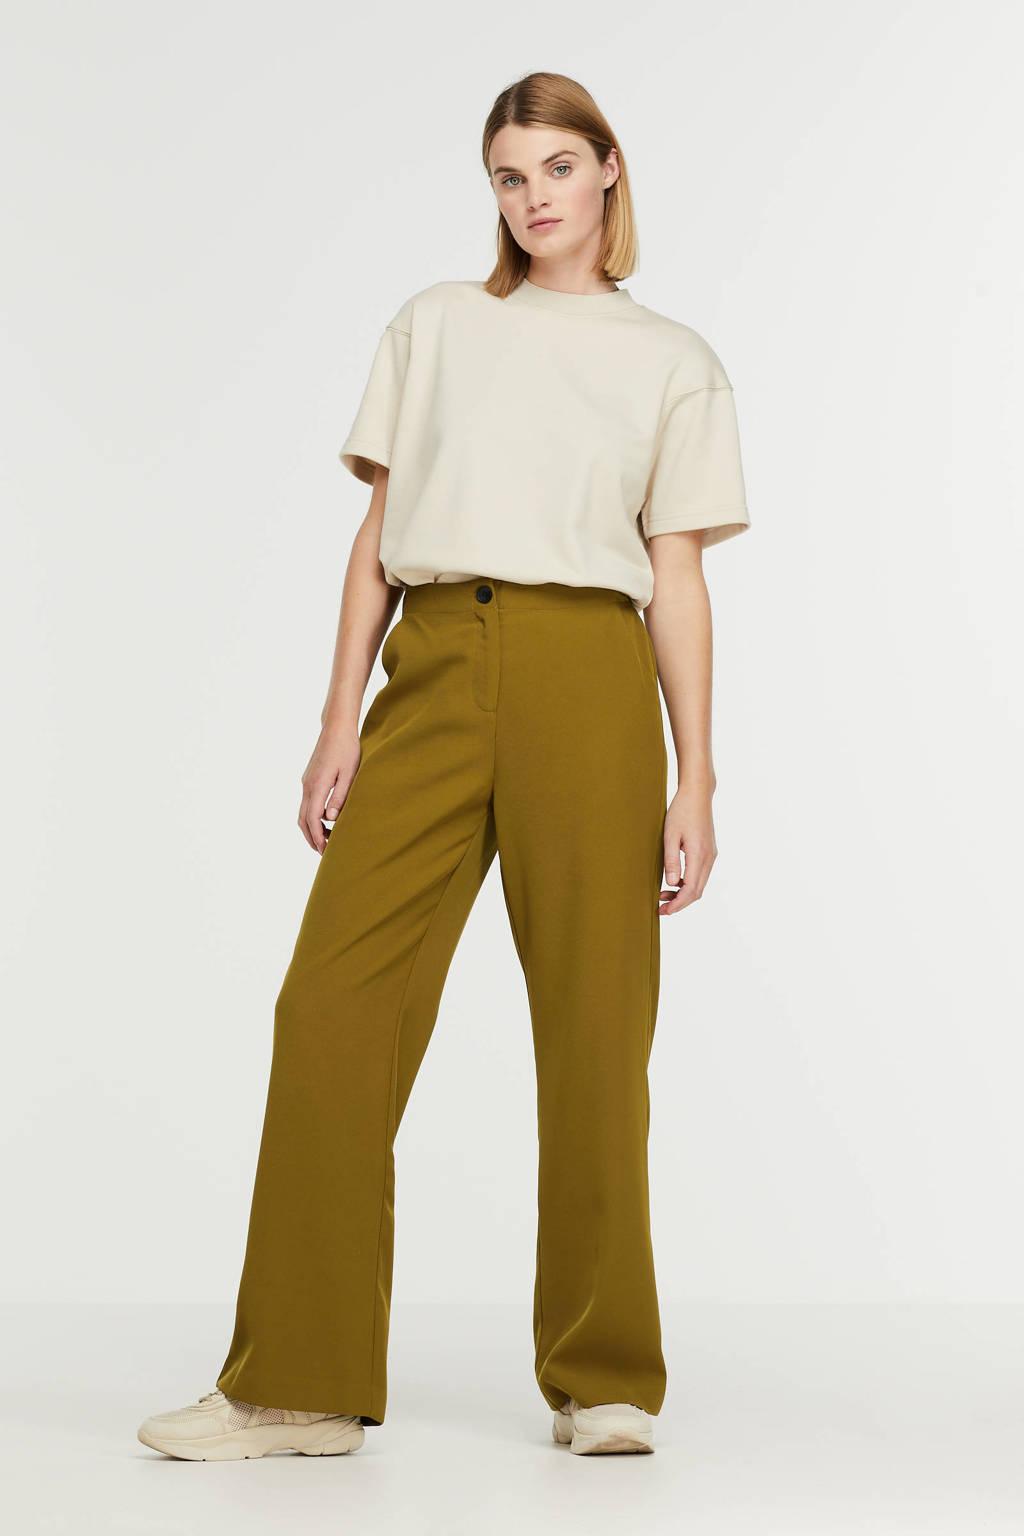 Ydence high waist wide leg pantalon Pants Solange olive, Olive